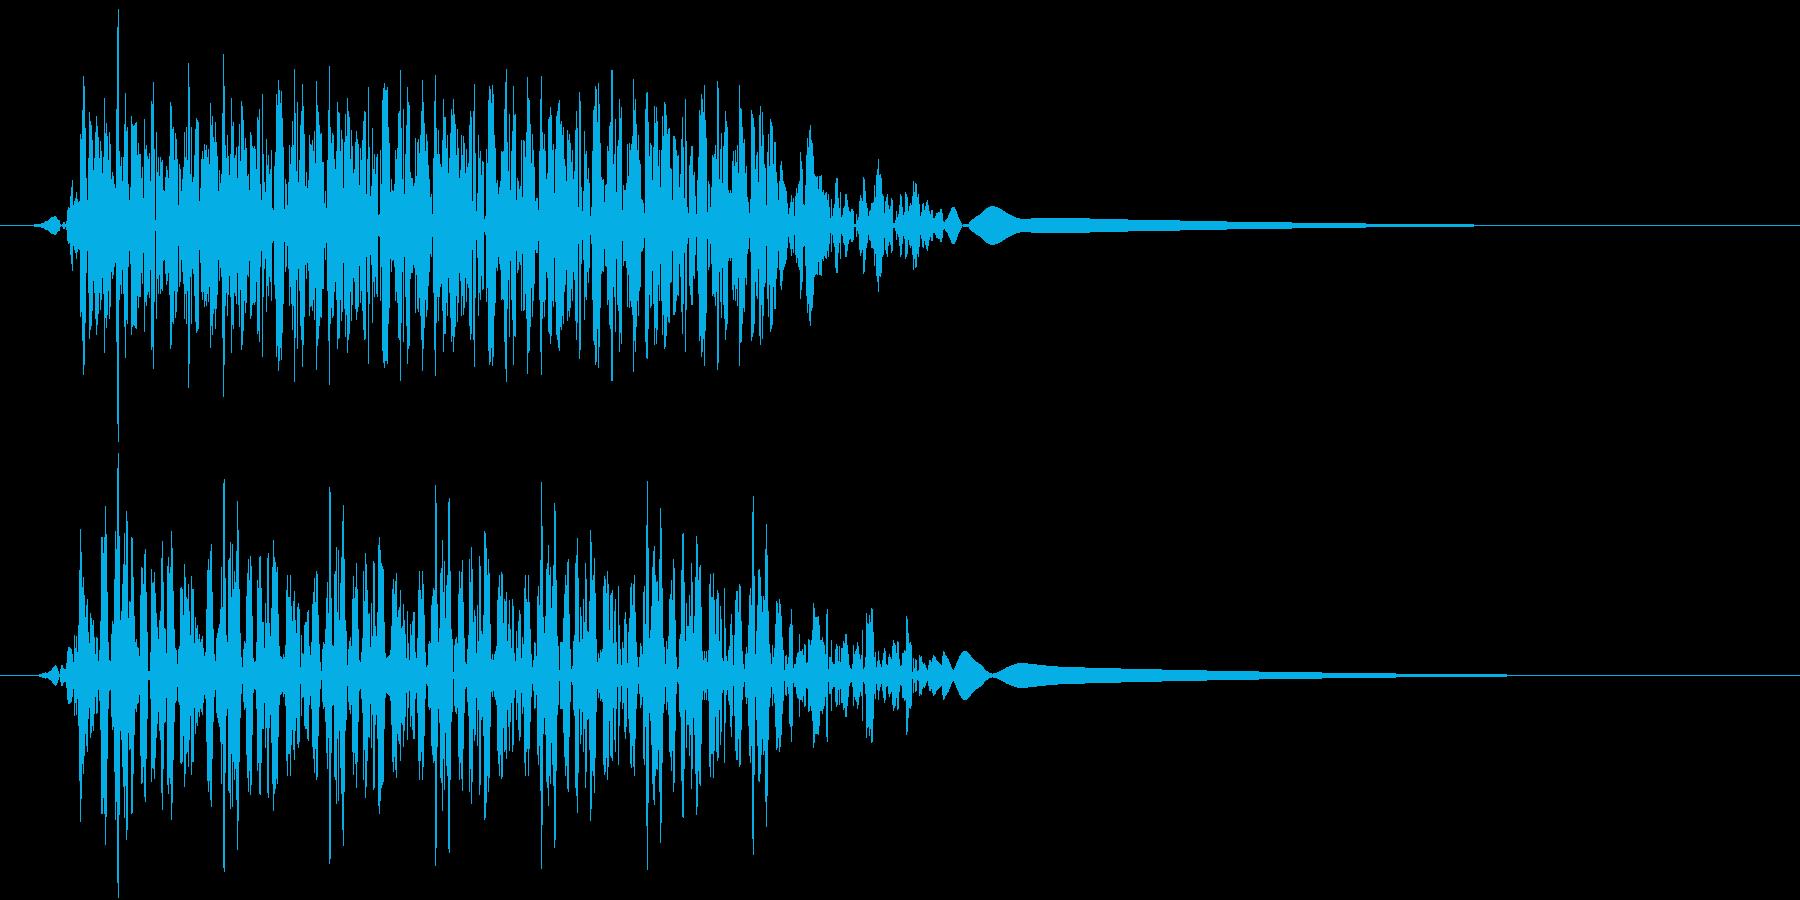 Push 汎用決定・セレクト音 10の再生済みの波形